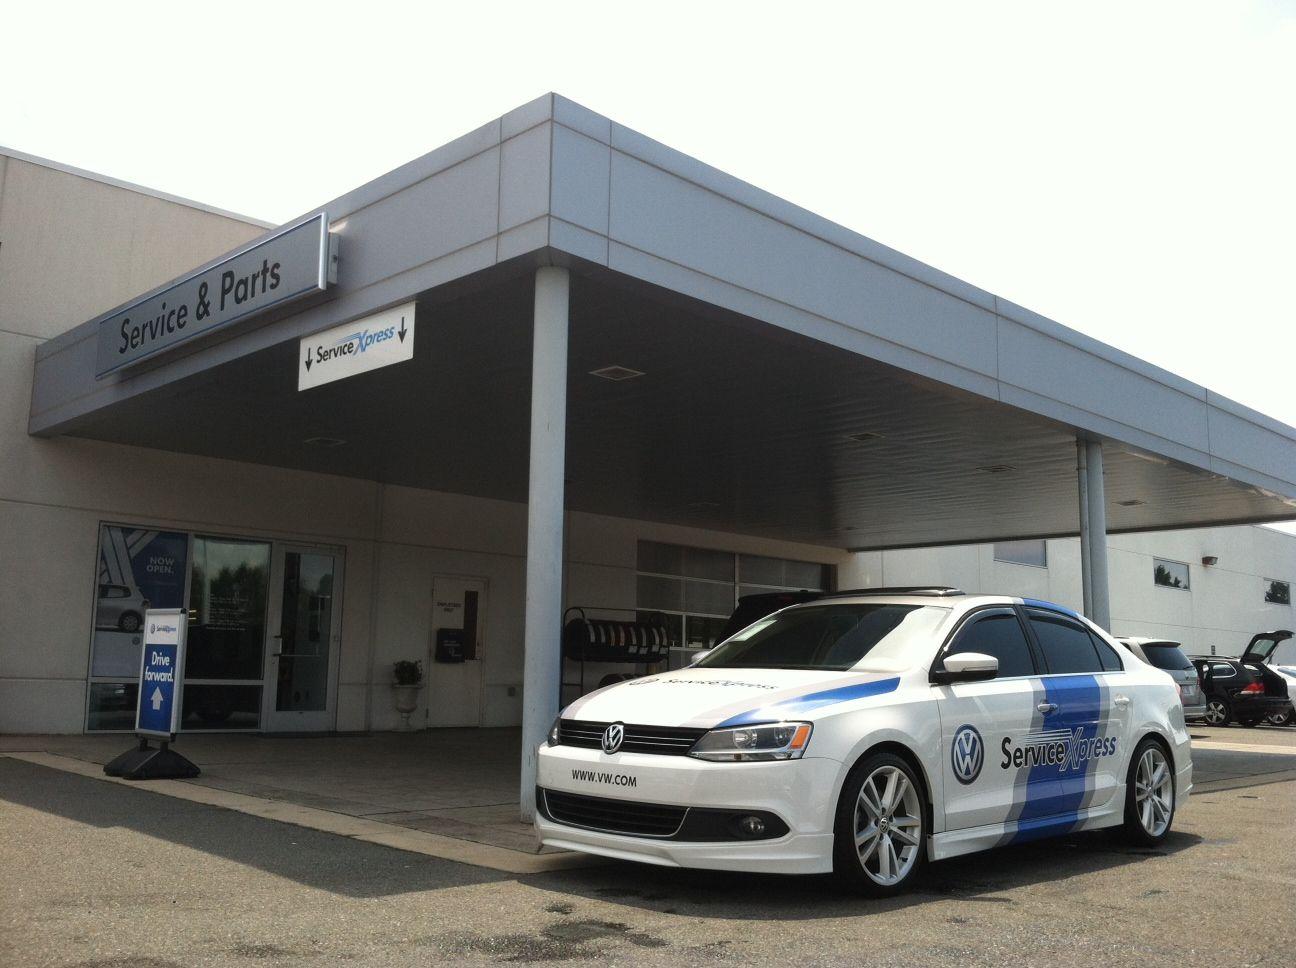 Carolina Volkswagen Service Express NOW OPEN! No Waiting